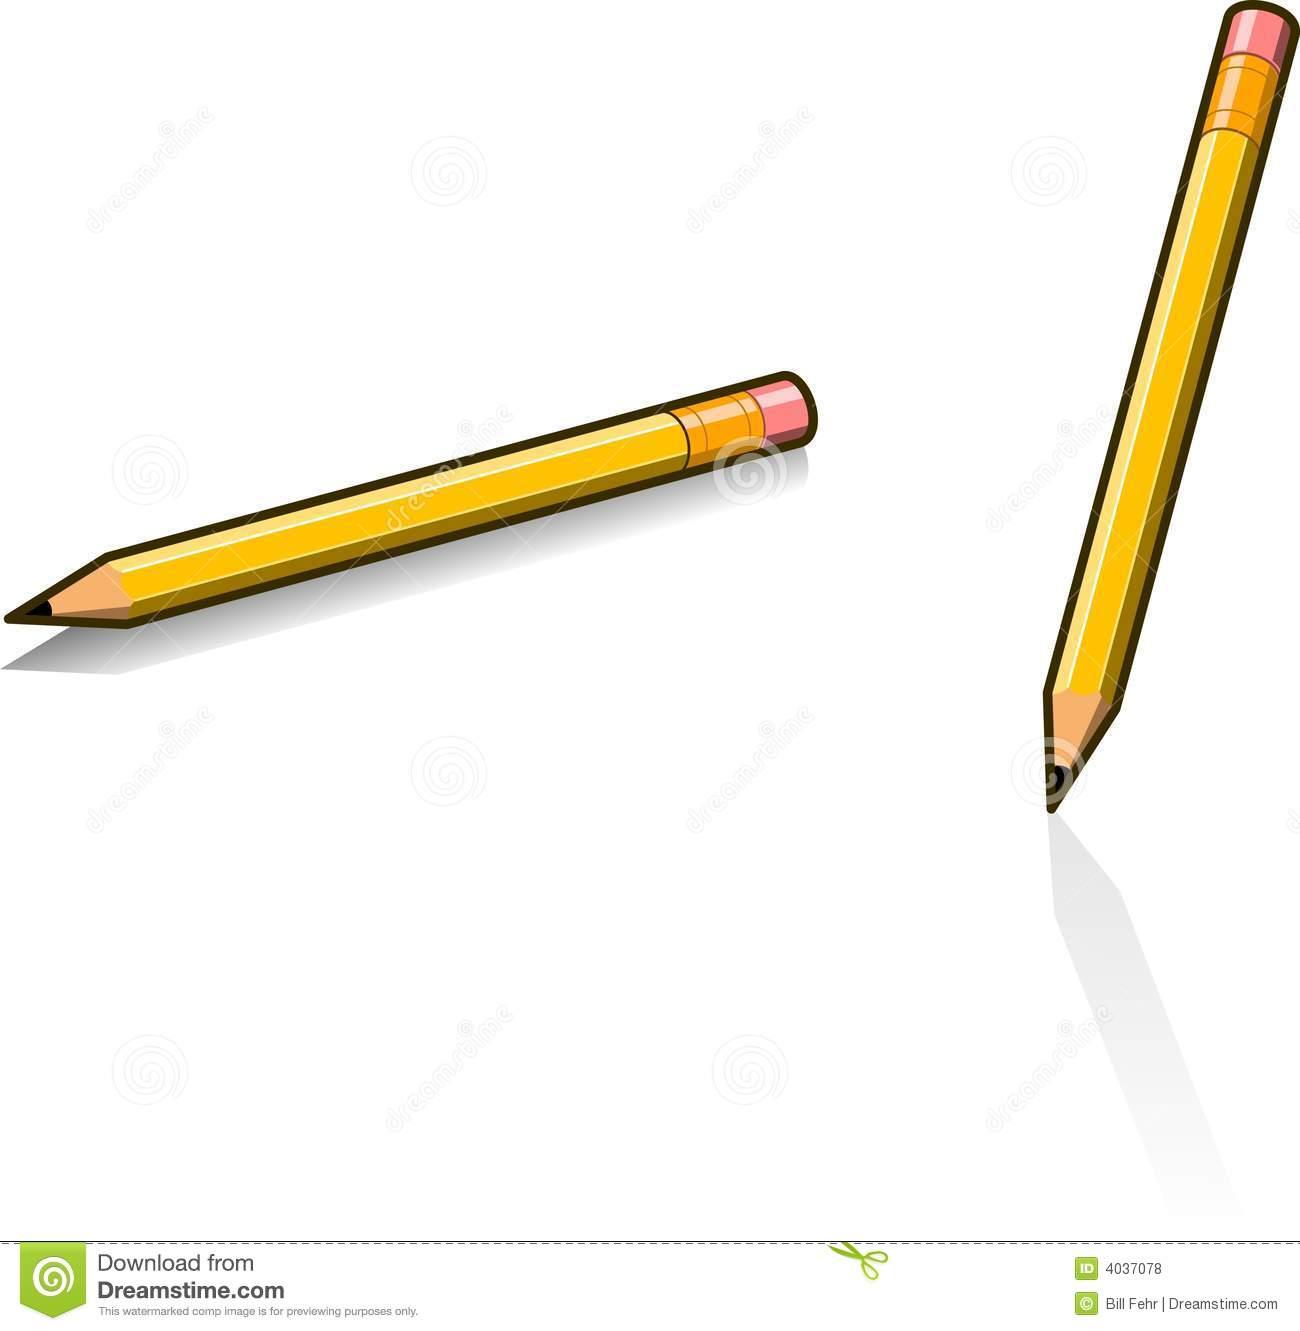 Horizontal Pencil Clipart #d4cmSK - Clipart Kid